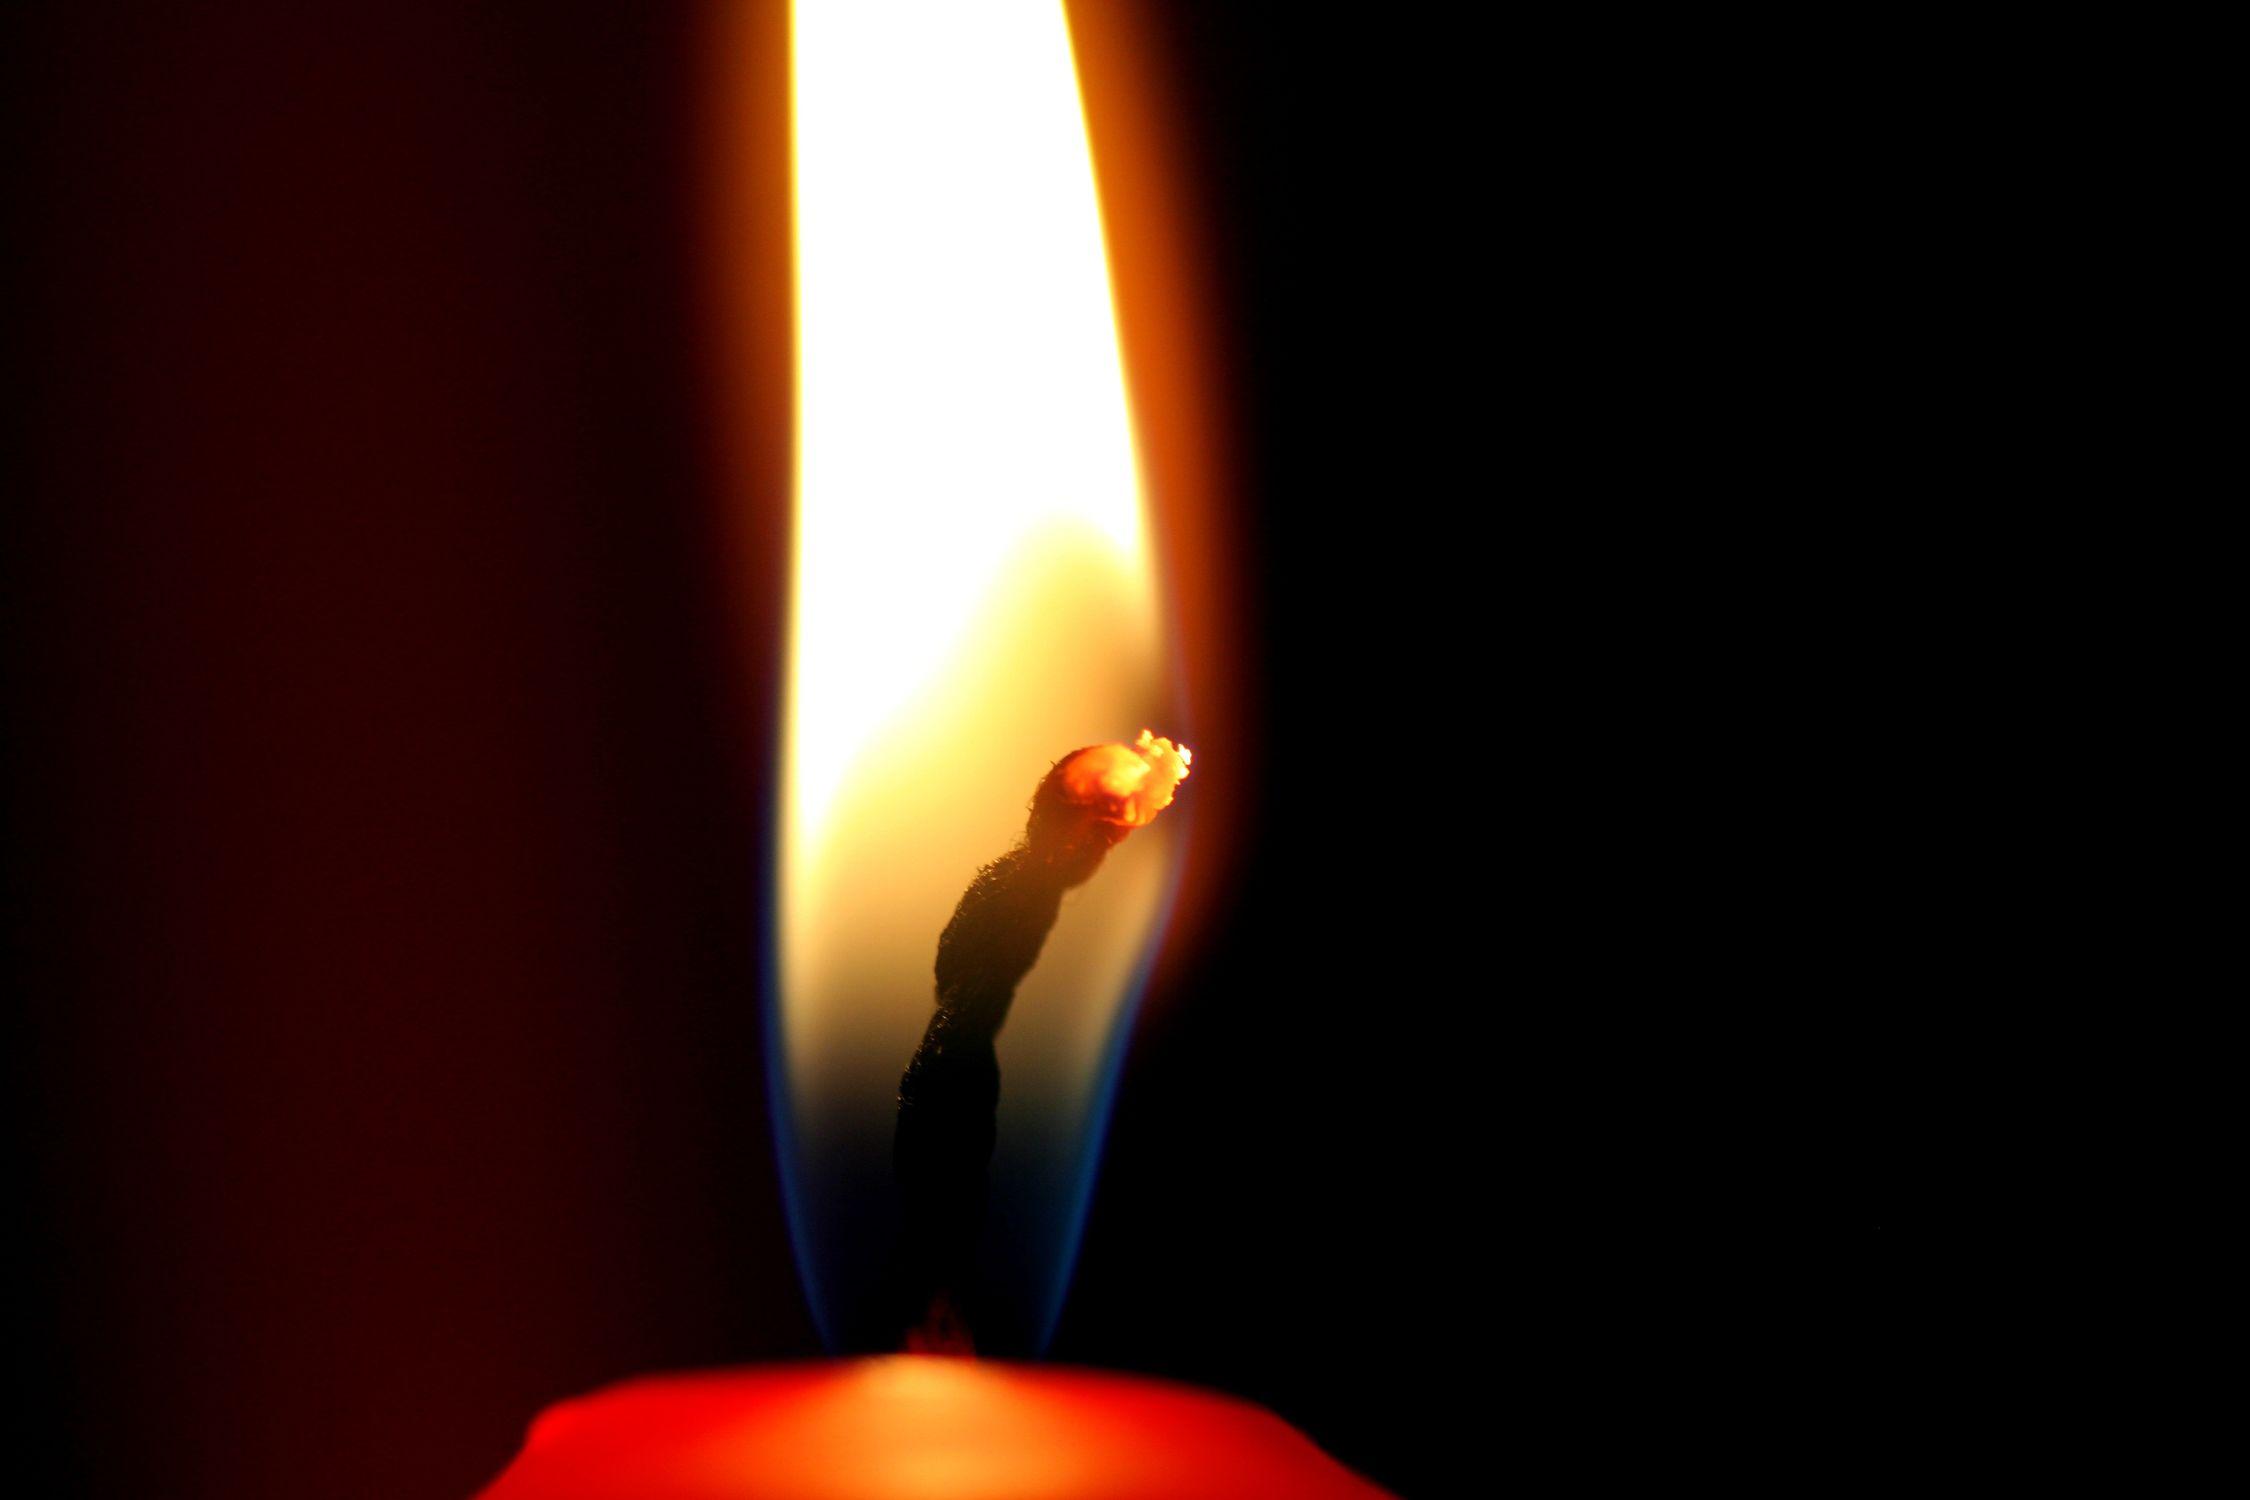 Bild mit Natur, Elemente, Feuer, Flammen, Kerze, Kerzen, Kerzenlicht, romantik, Kerzenschein, Licht Bilder, Meditation, candel, candel light, light, Licht